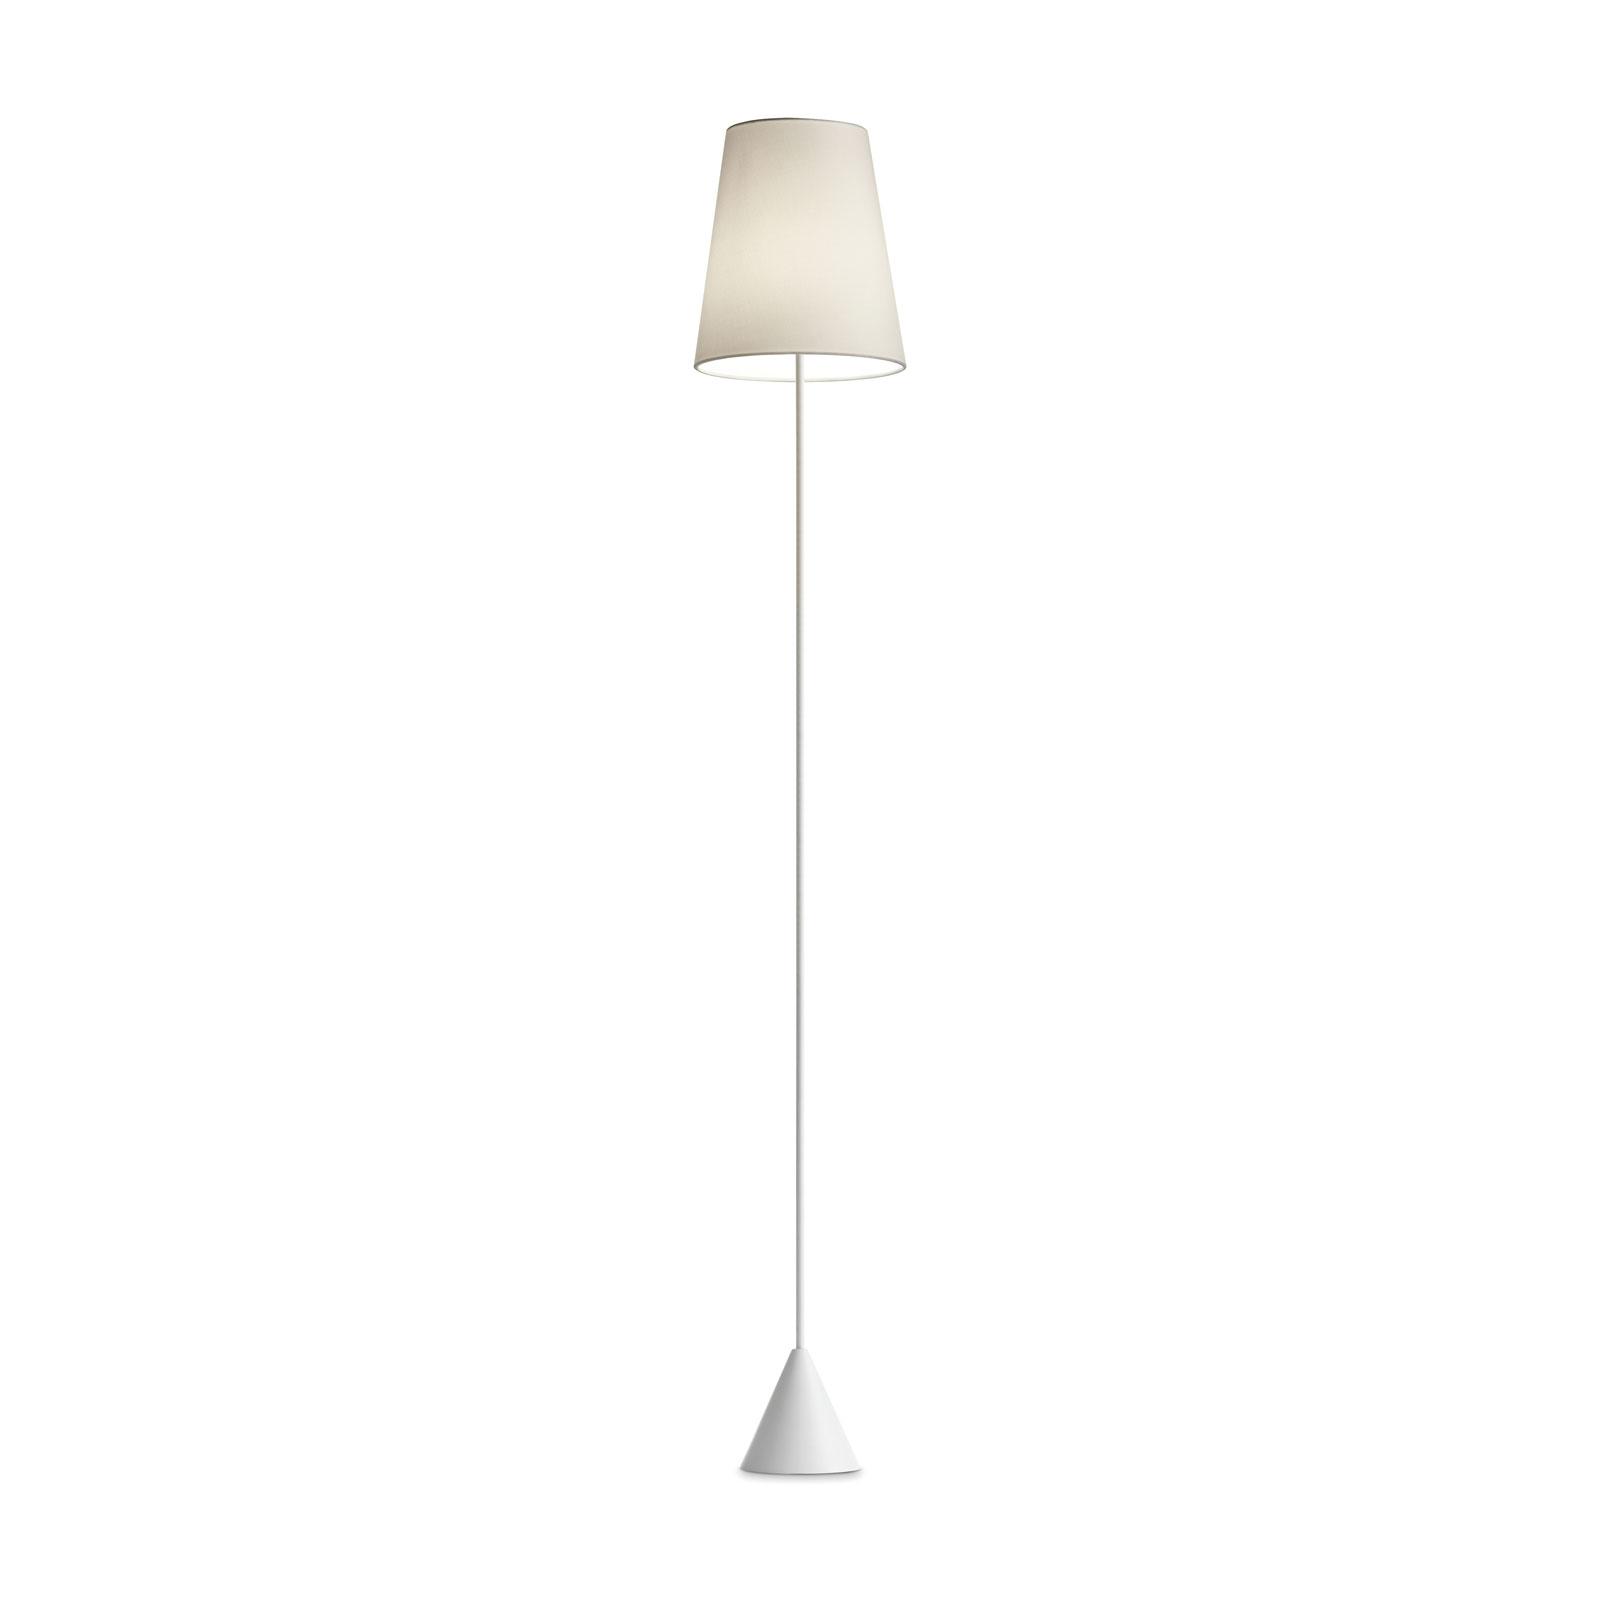 Modo Luce Lucilla lampadaire Ø 24cm blanc/ivoire